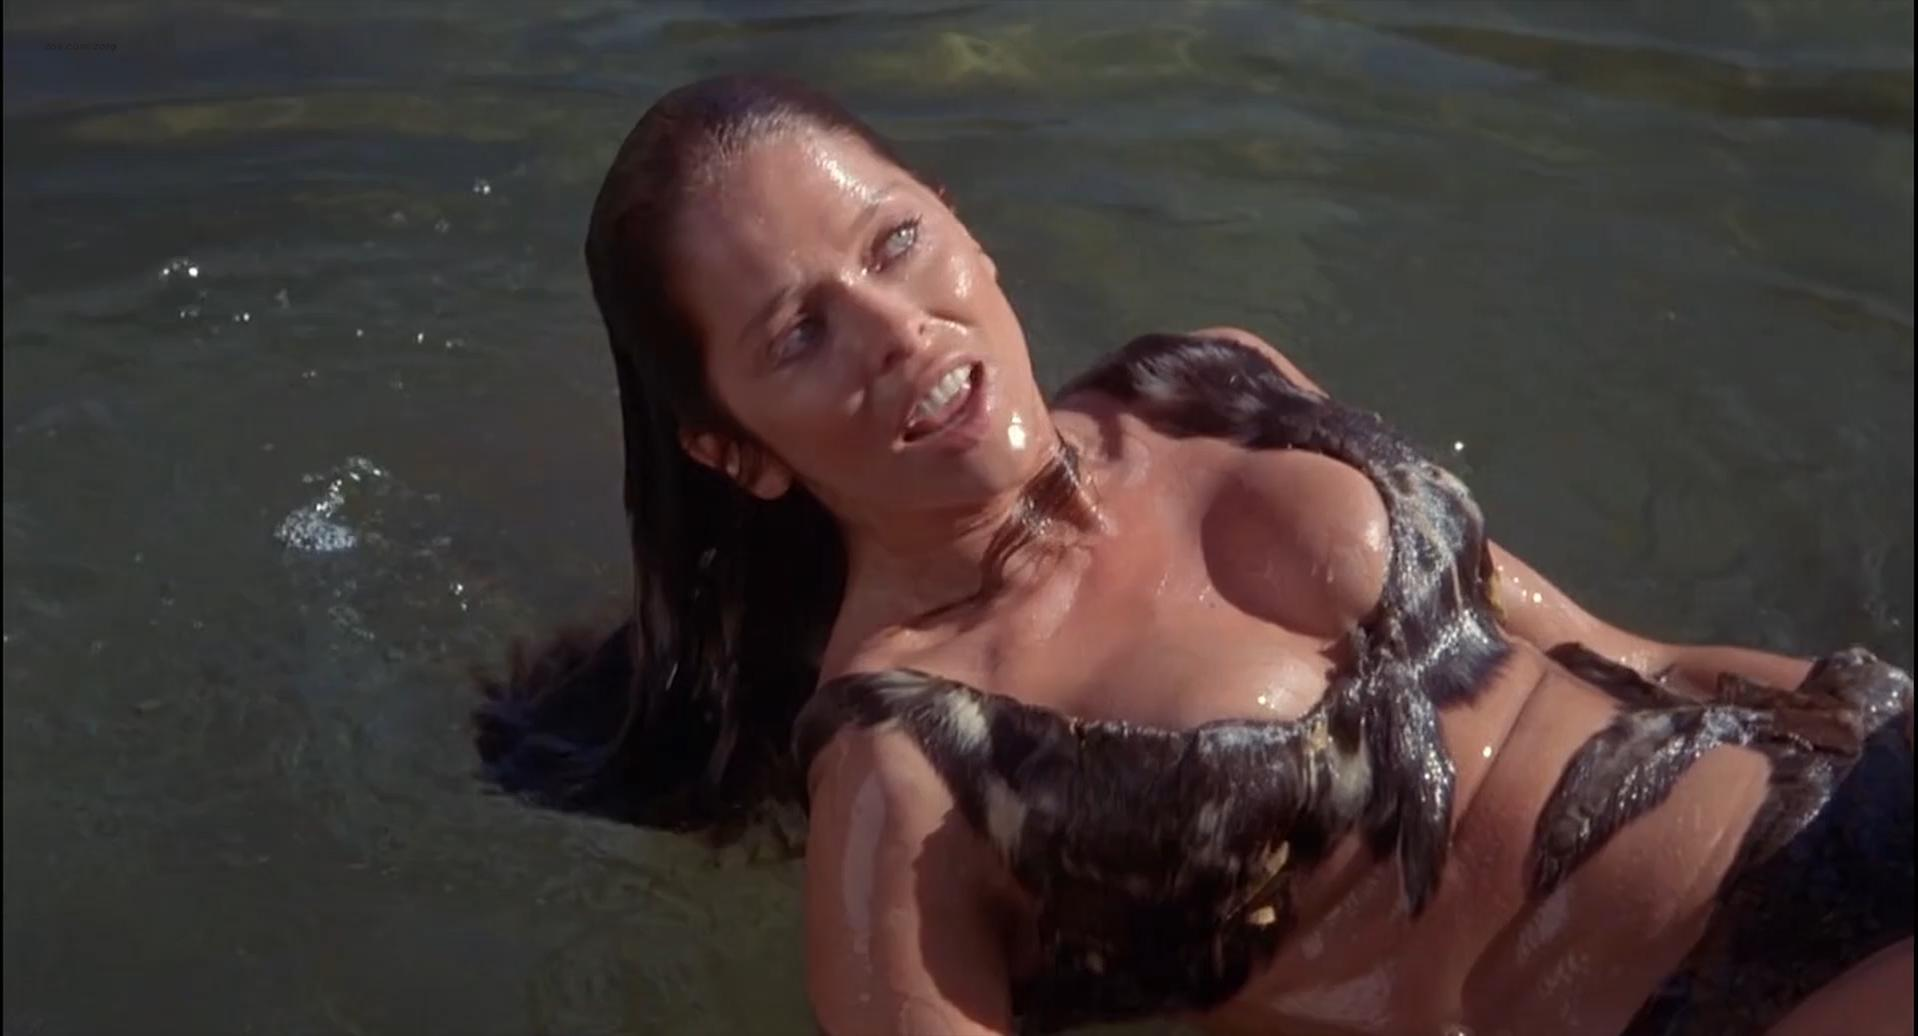 Barbara bach hot porno